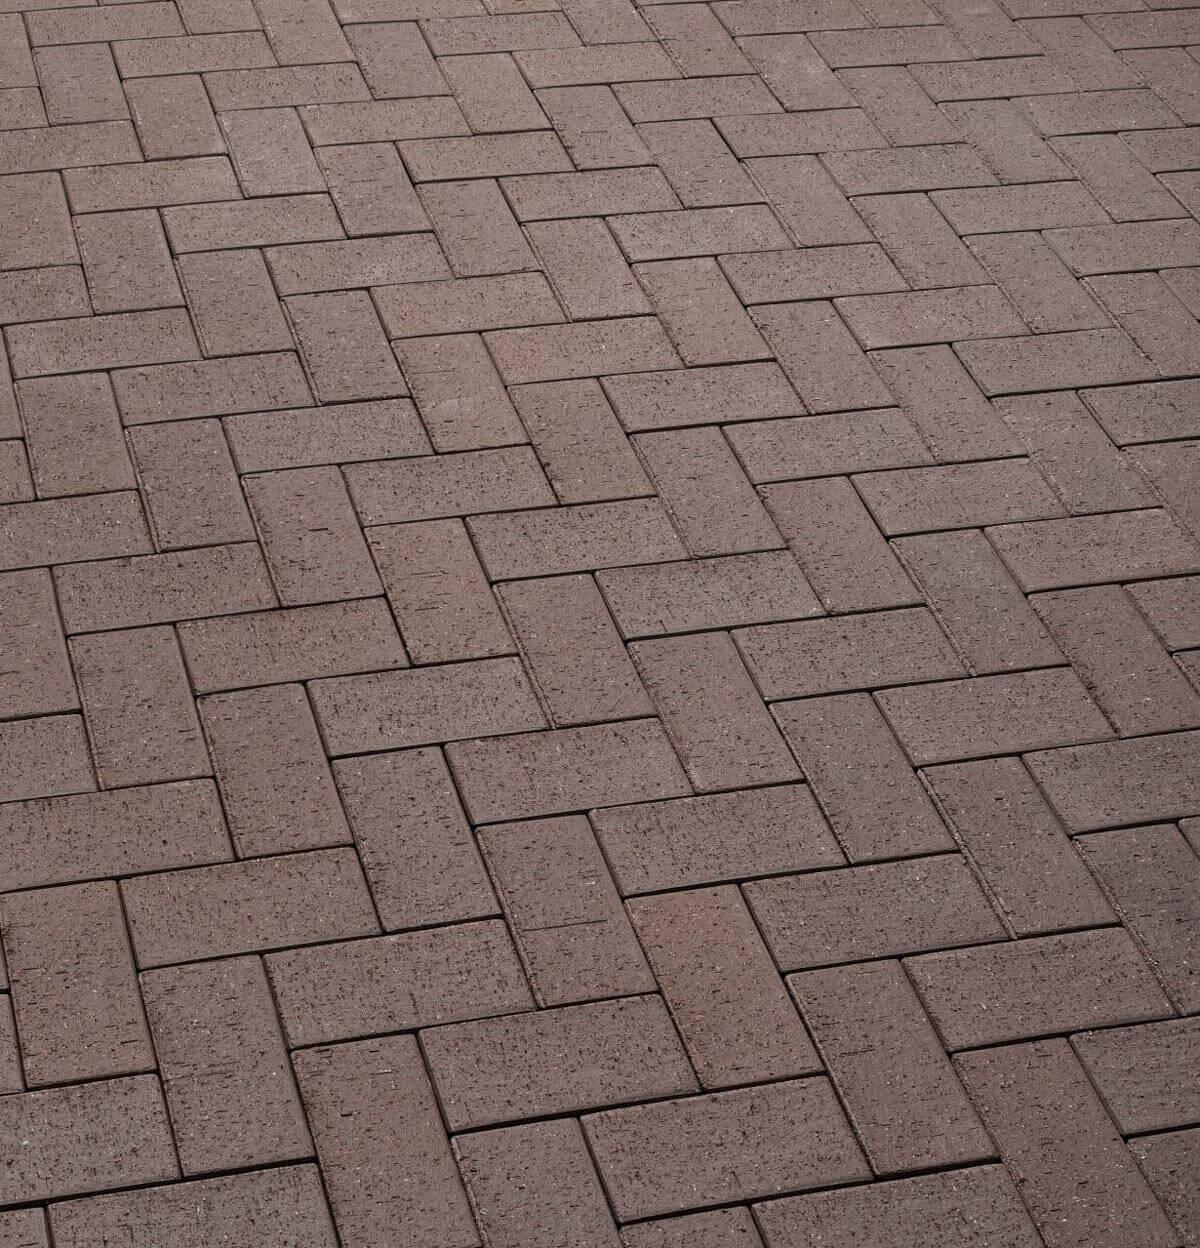 Feldhaus Klinker - P502SKF, Umbra plano, темно-коричневый, с оттенками, 200x100x40 - Клинкерная тротуарная брусчатка